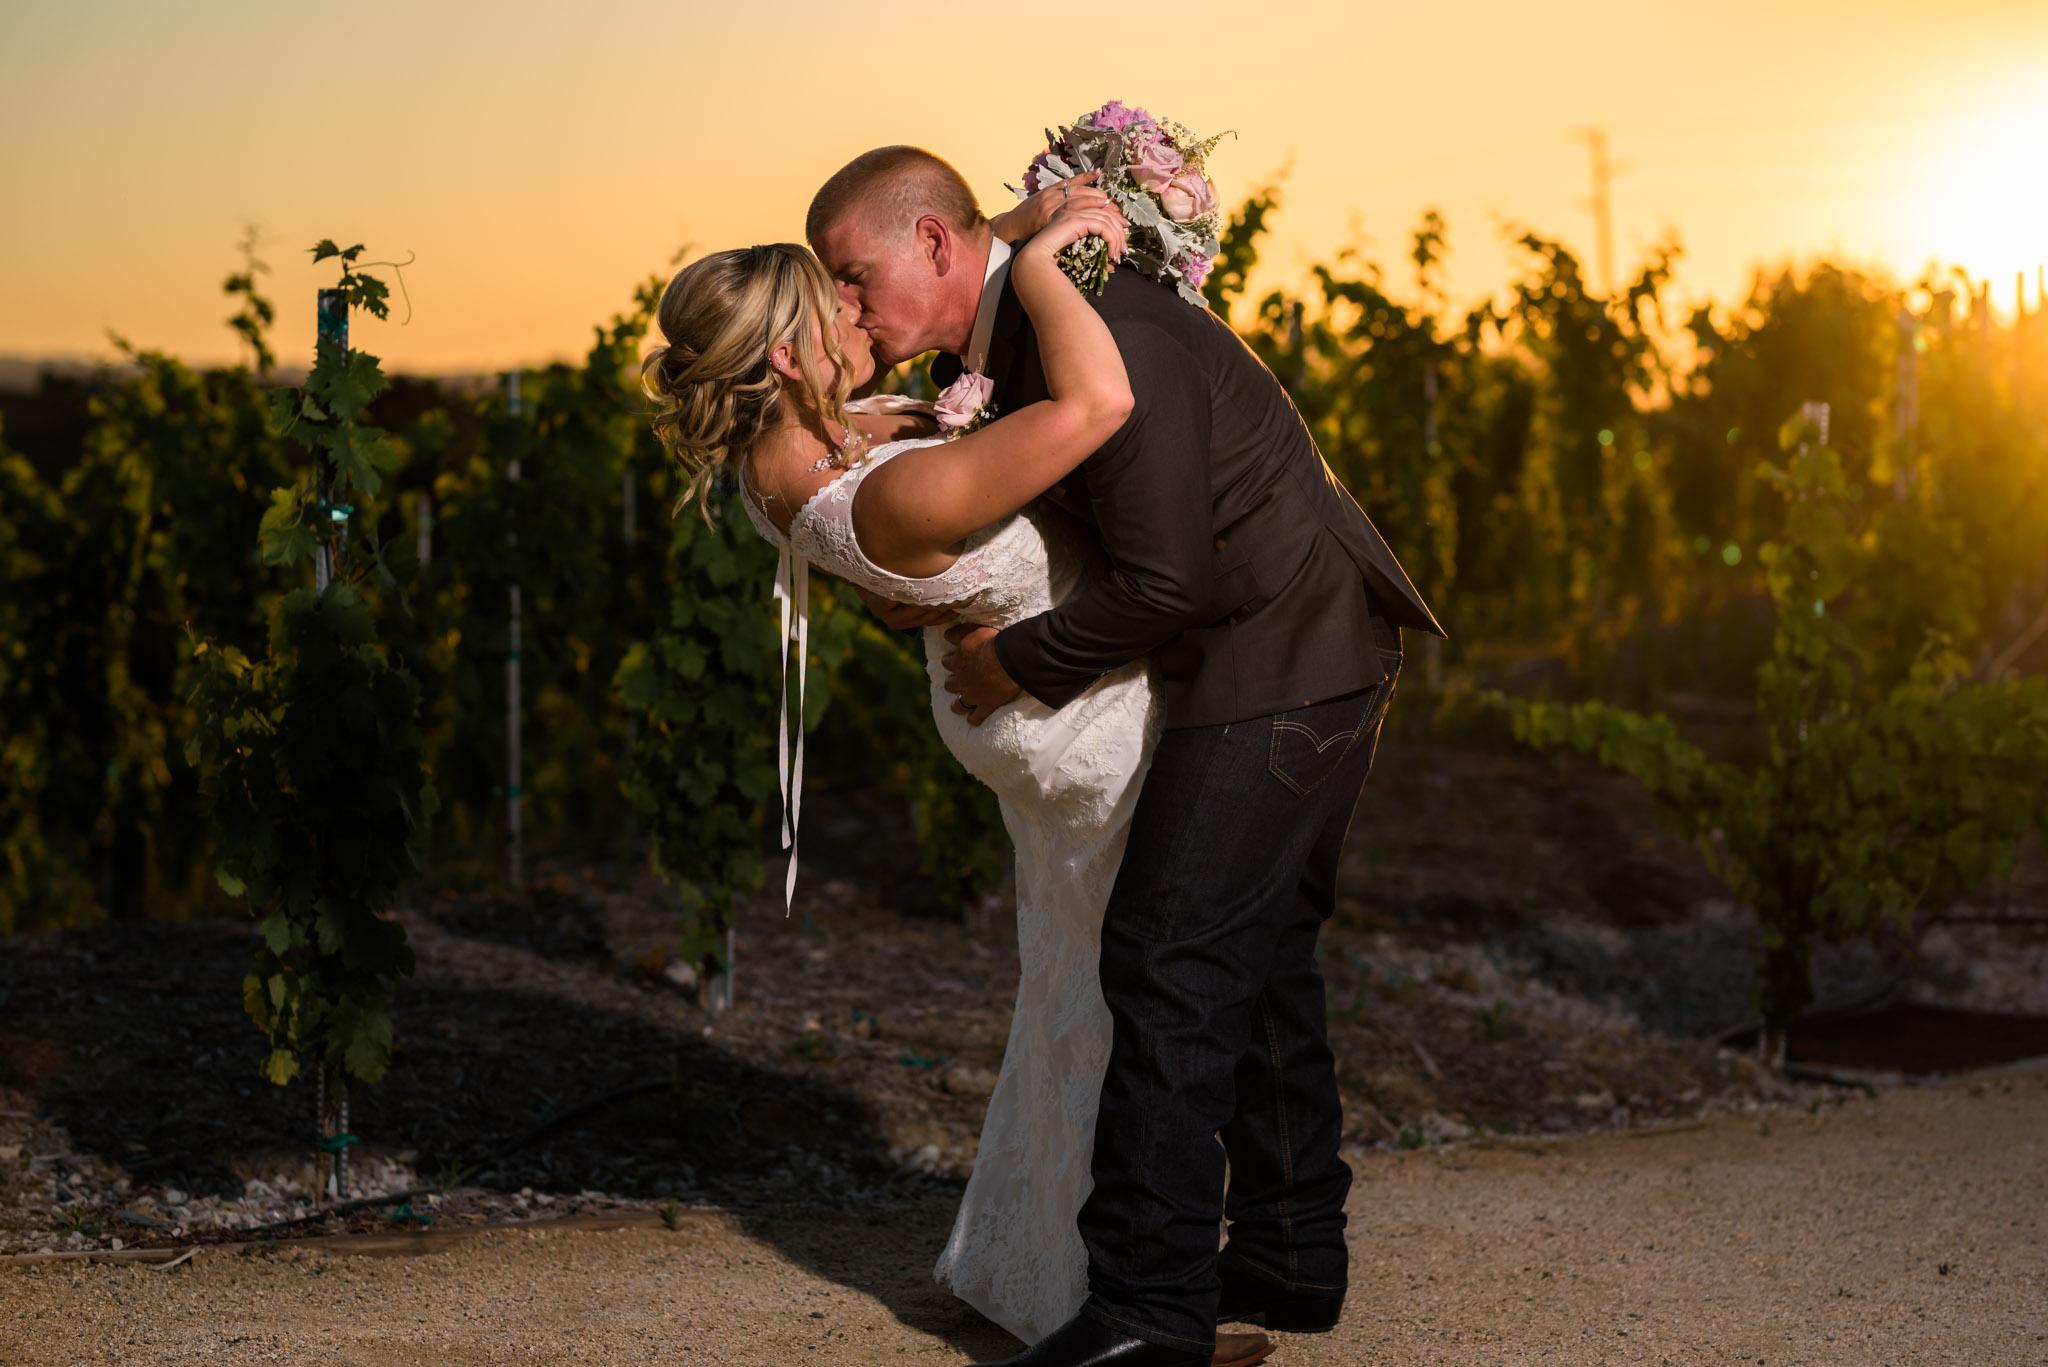 Avensole-Winery-Temecula-Wedding-Josh-and-Olivia-3804.JPG